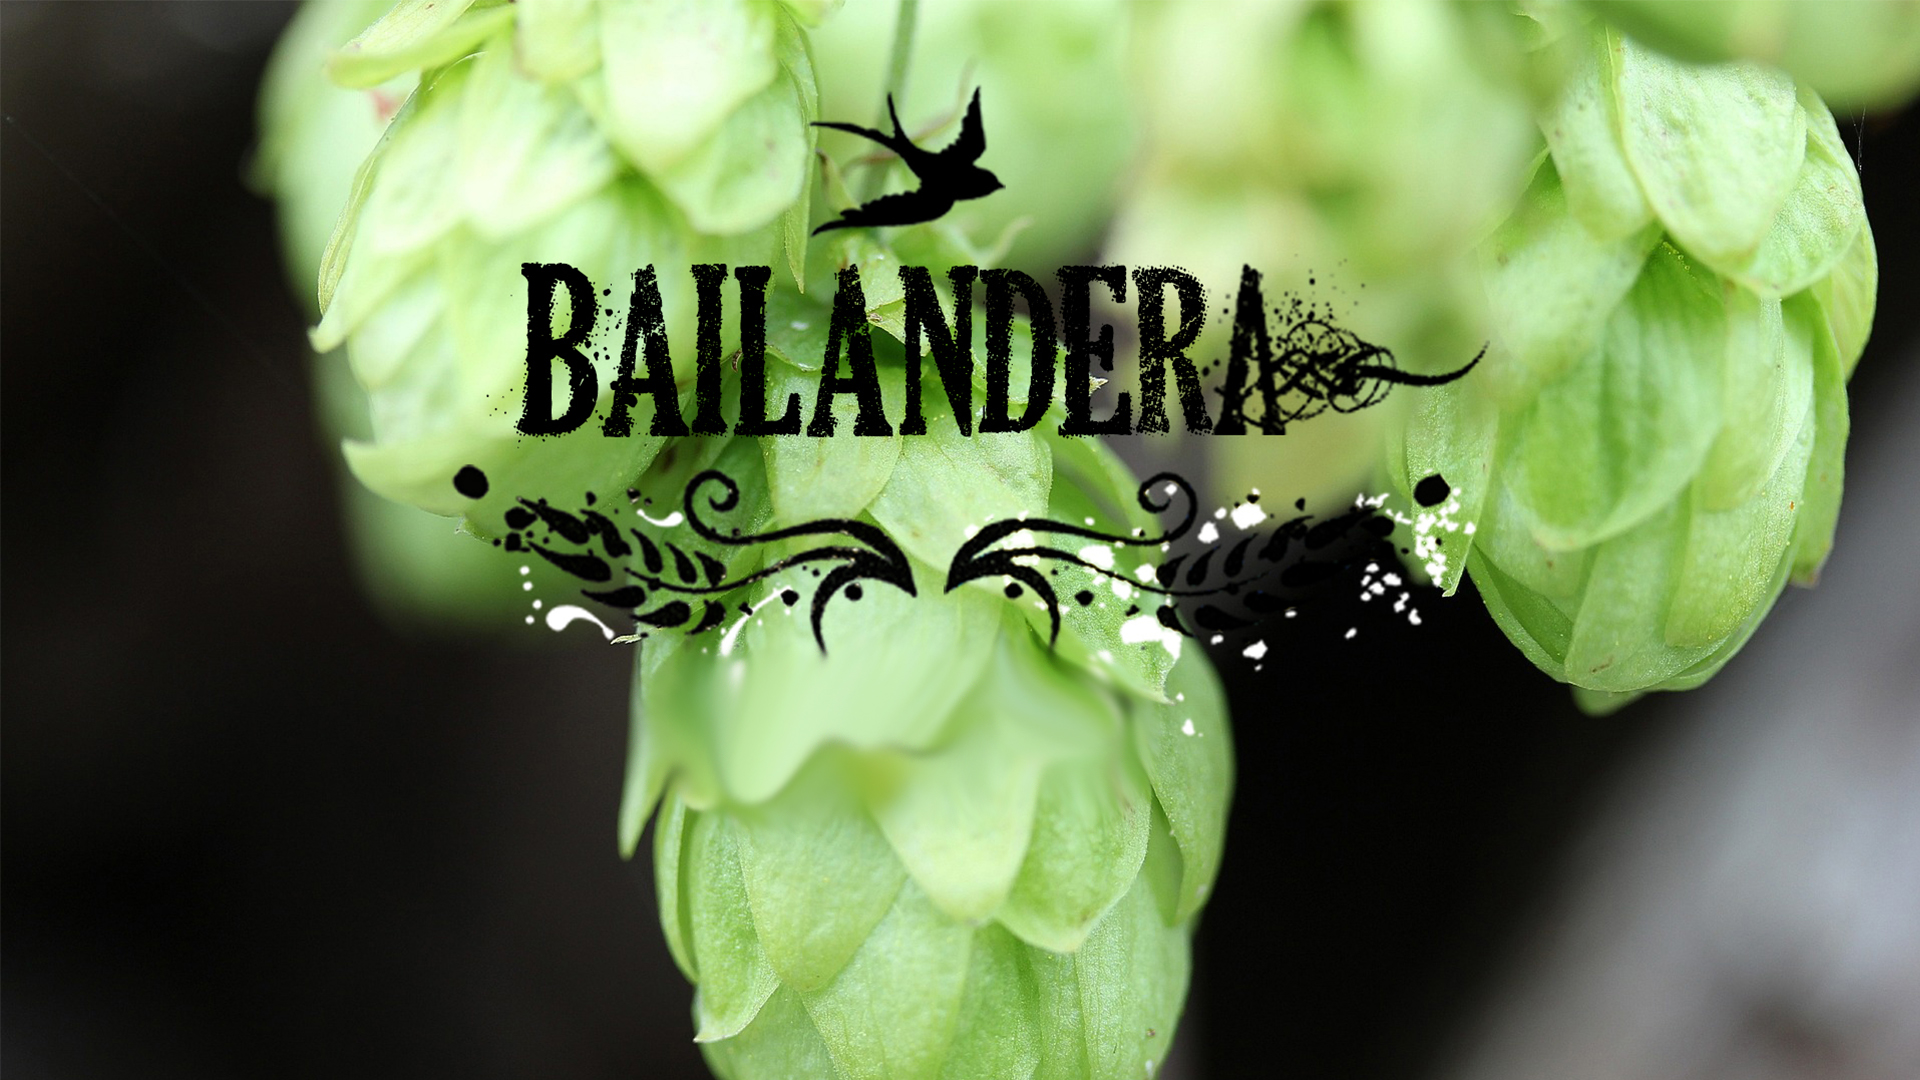 Cerveceria Bailandera